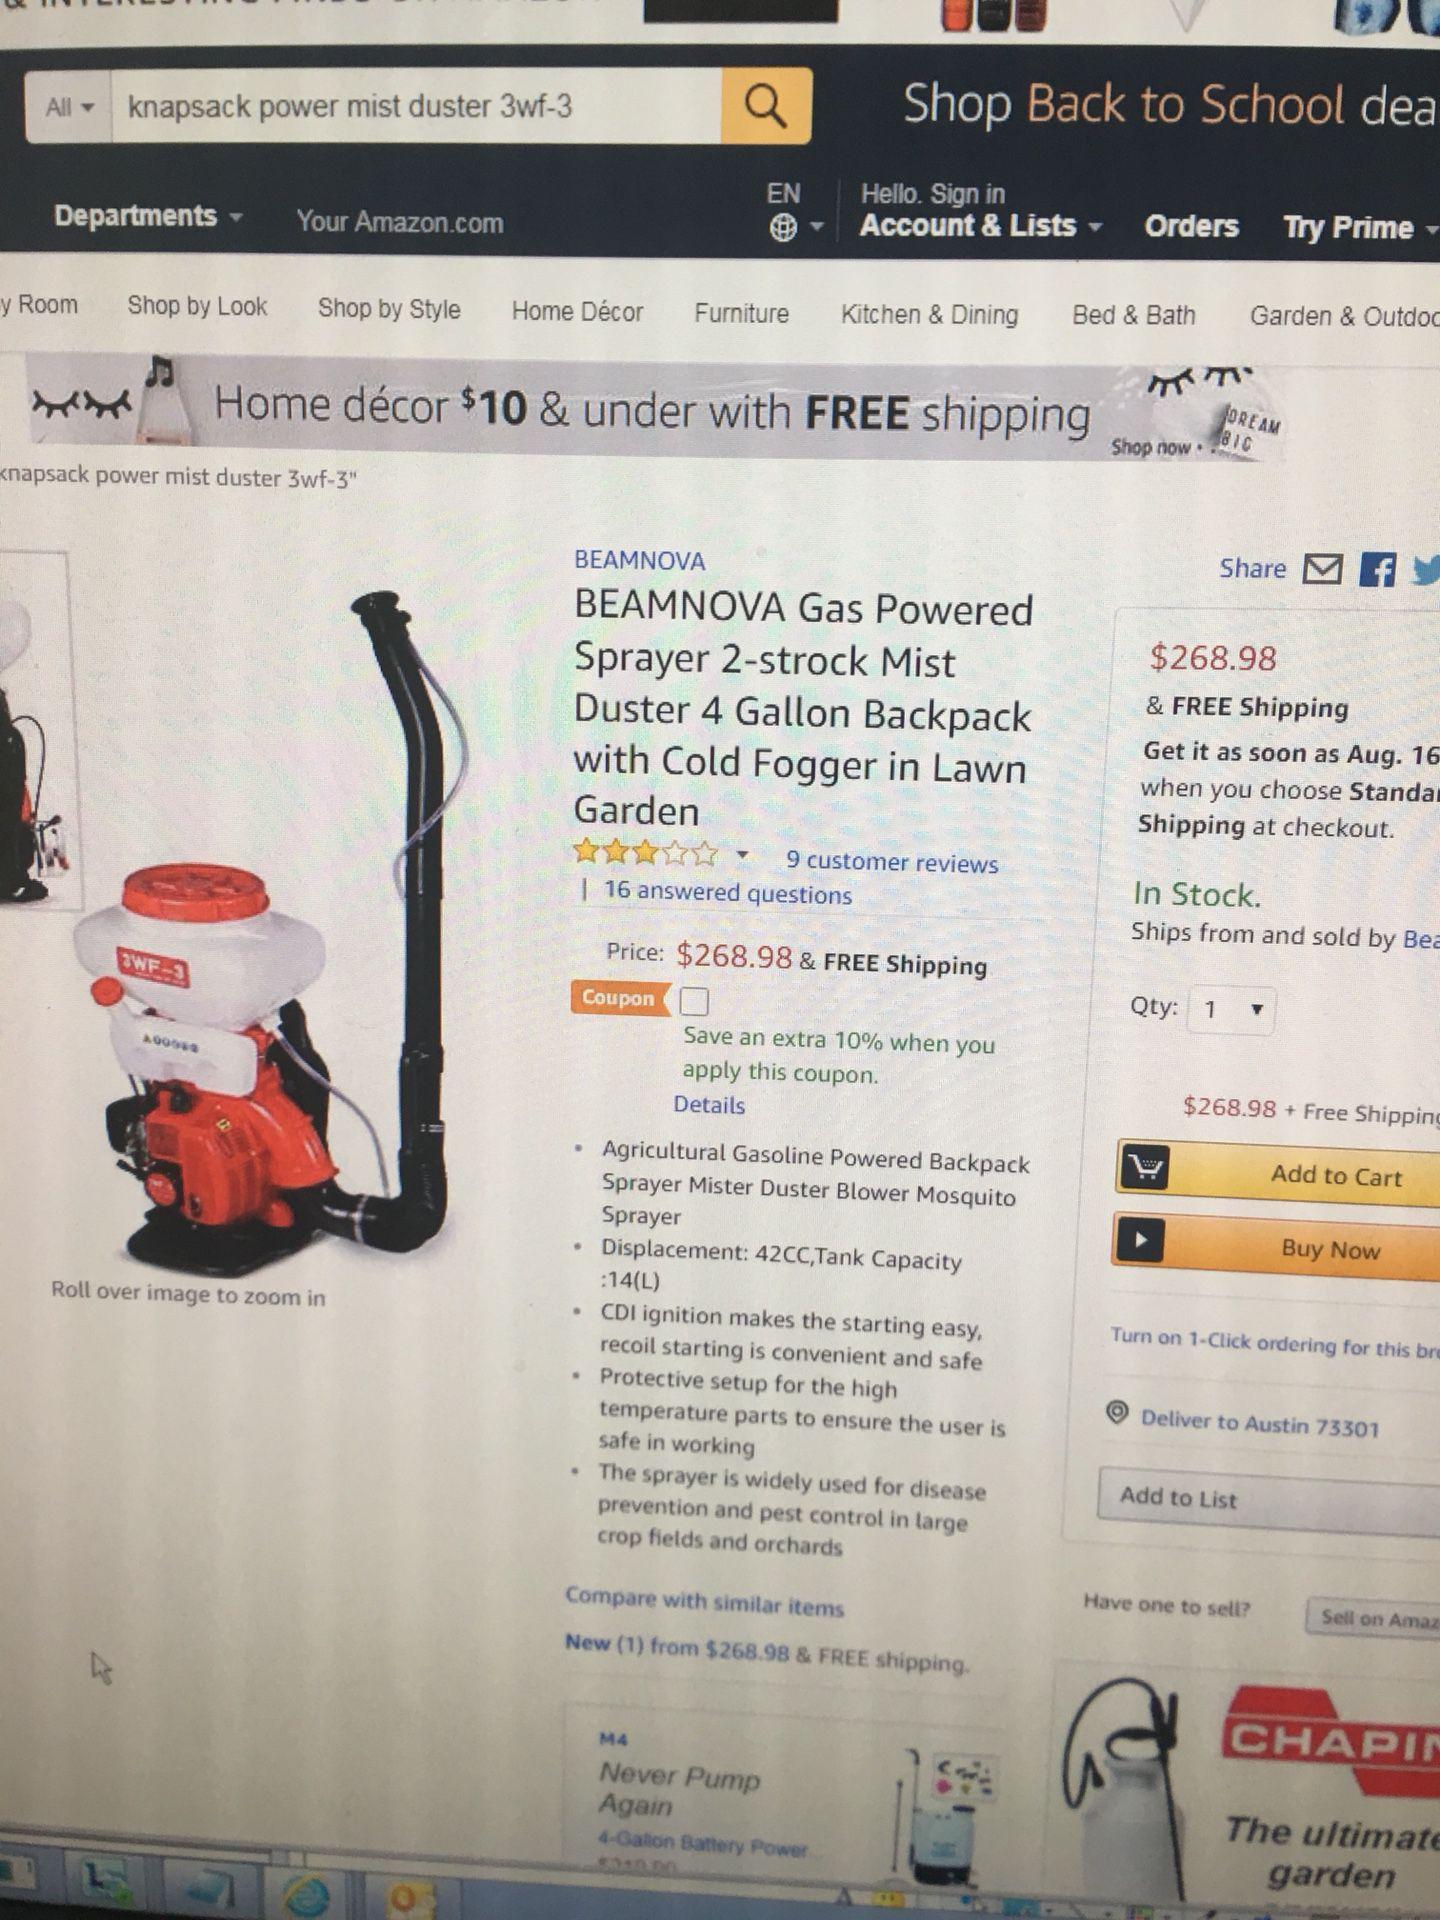 Duster backpack sprayer. Farm.